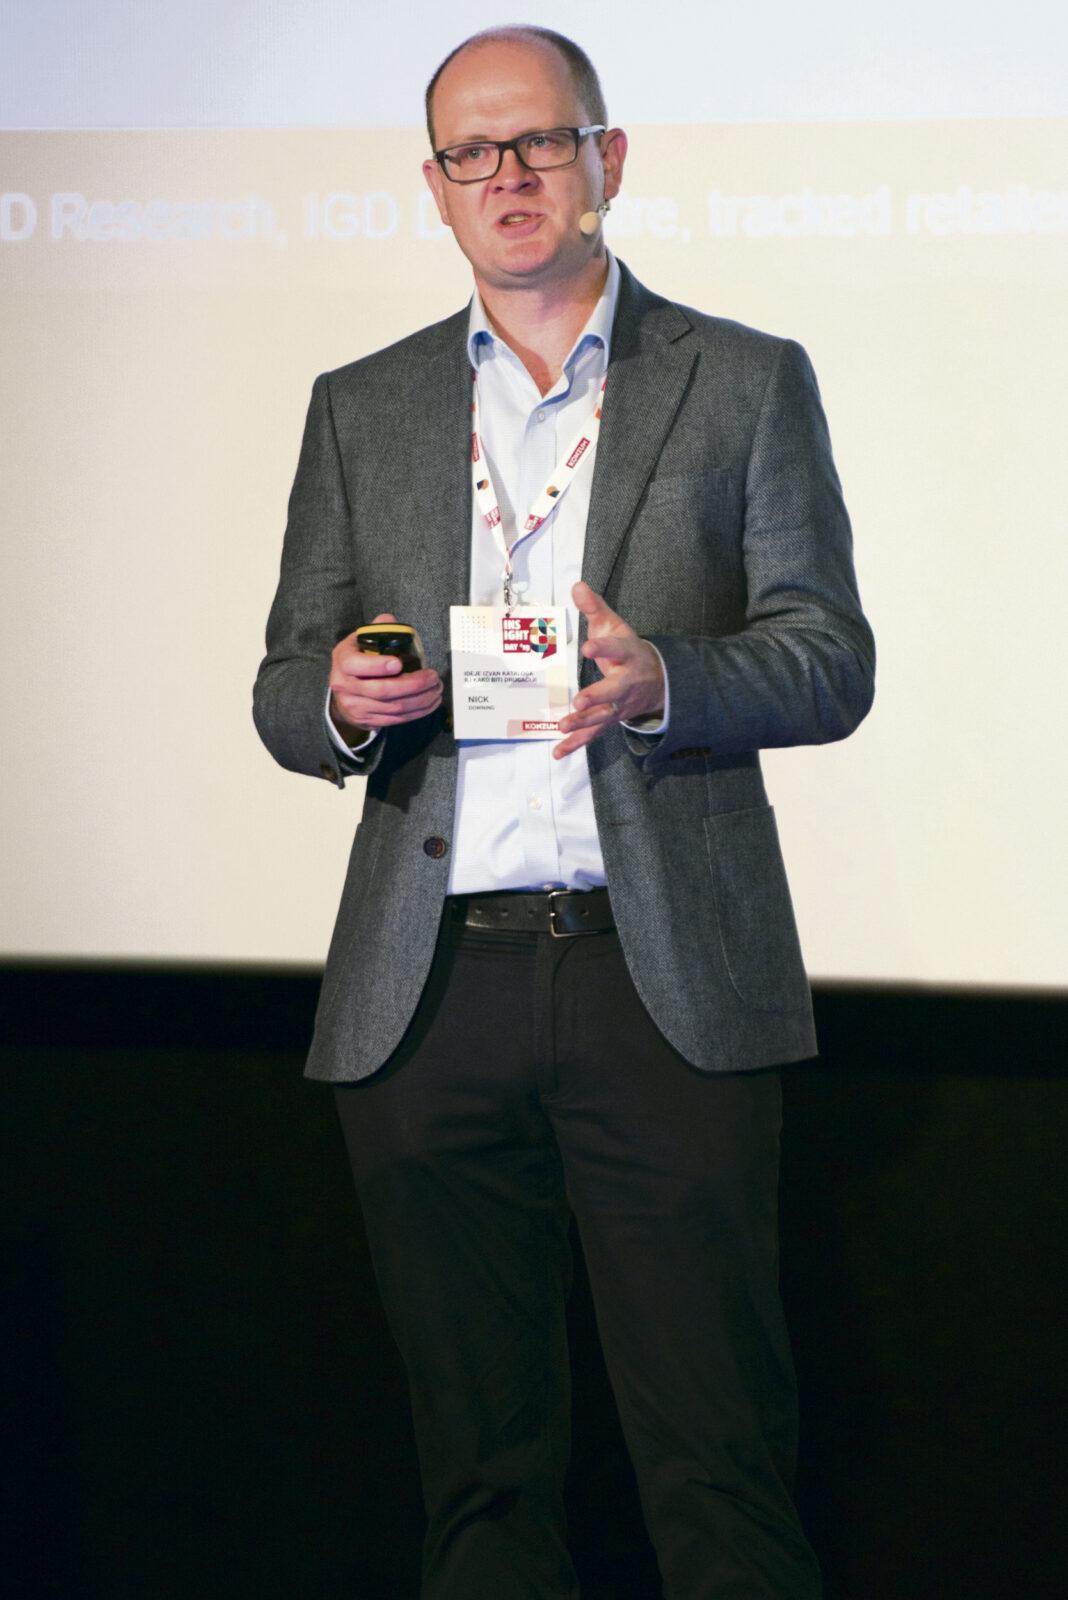 Nick Downing, komercijalni direktor IGD-a